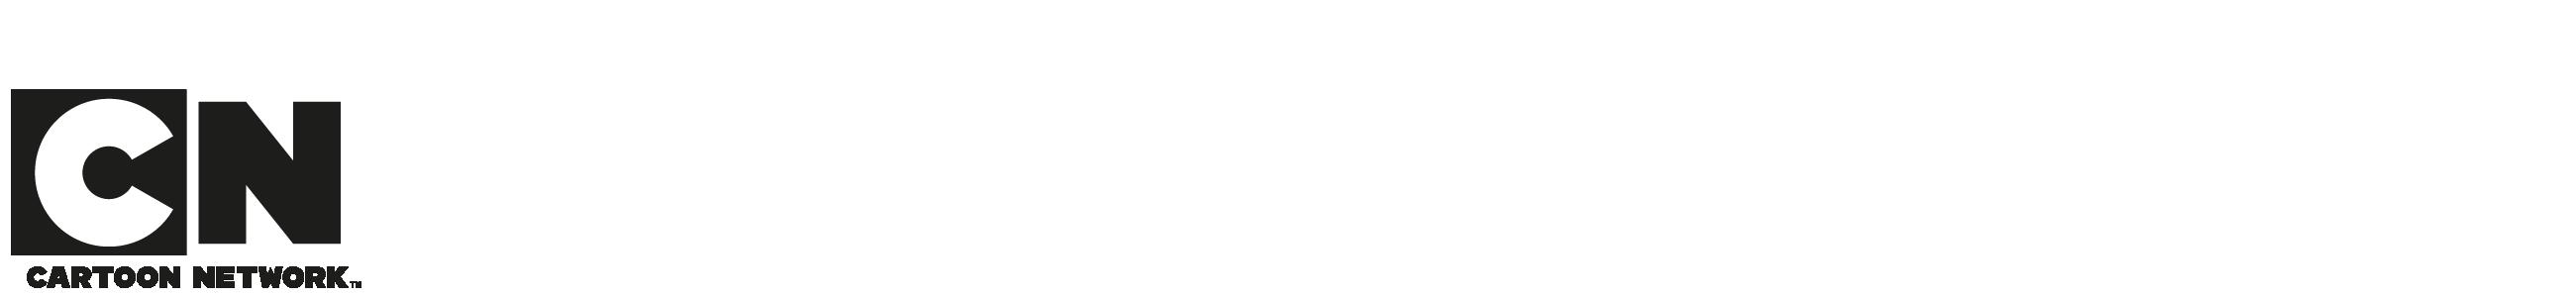 MADHOUSE – WEB_V3_CARTOON NETWORK – CLIENTES